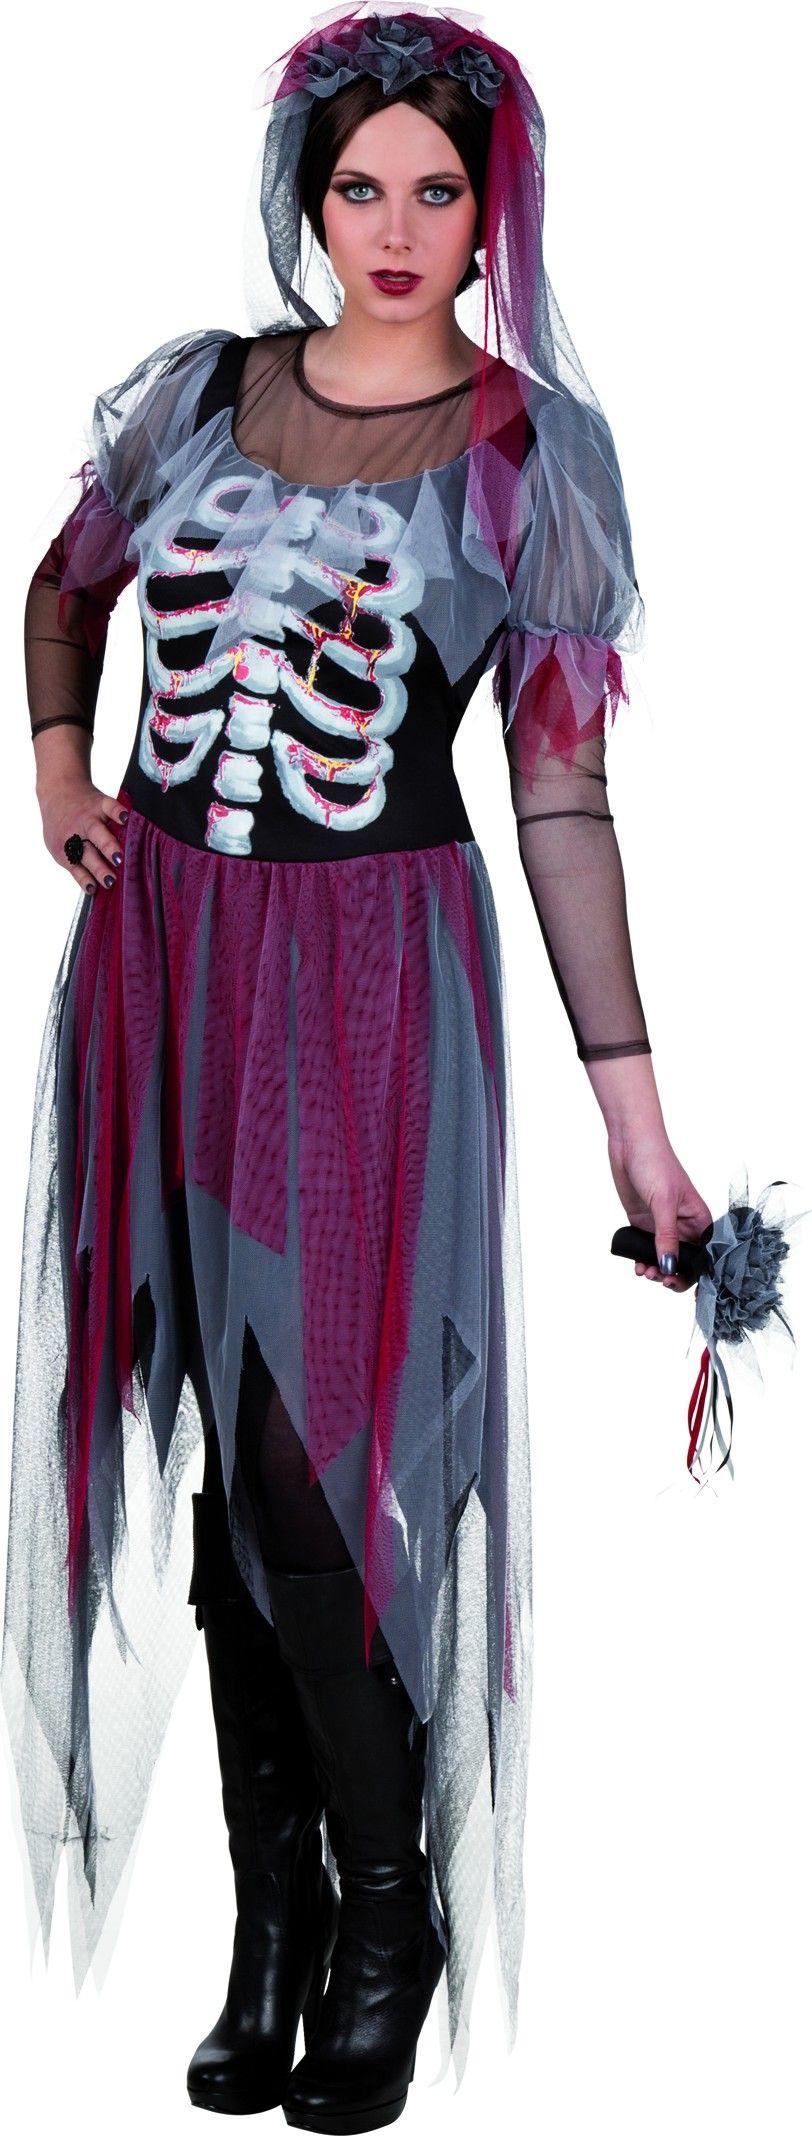 Disfraz de novia gótica mujer Halloween: Este disfraz de novia ...